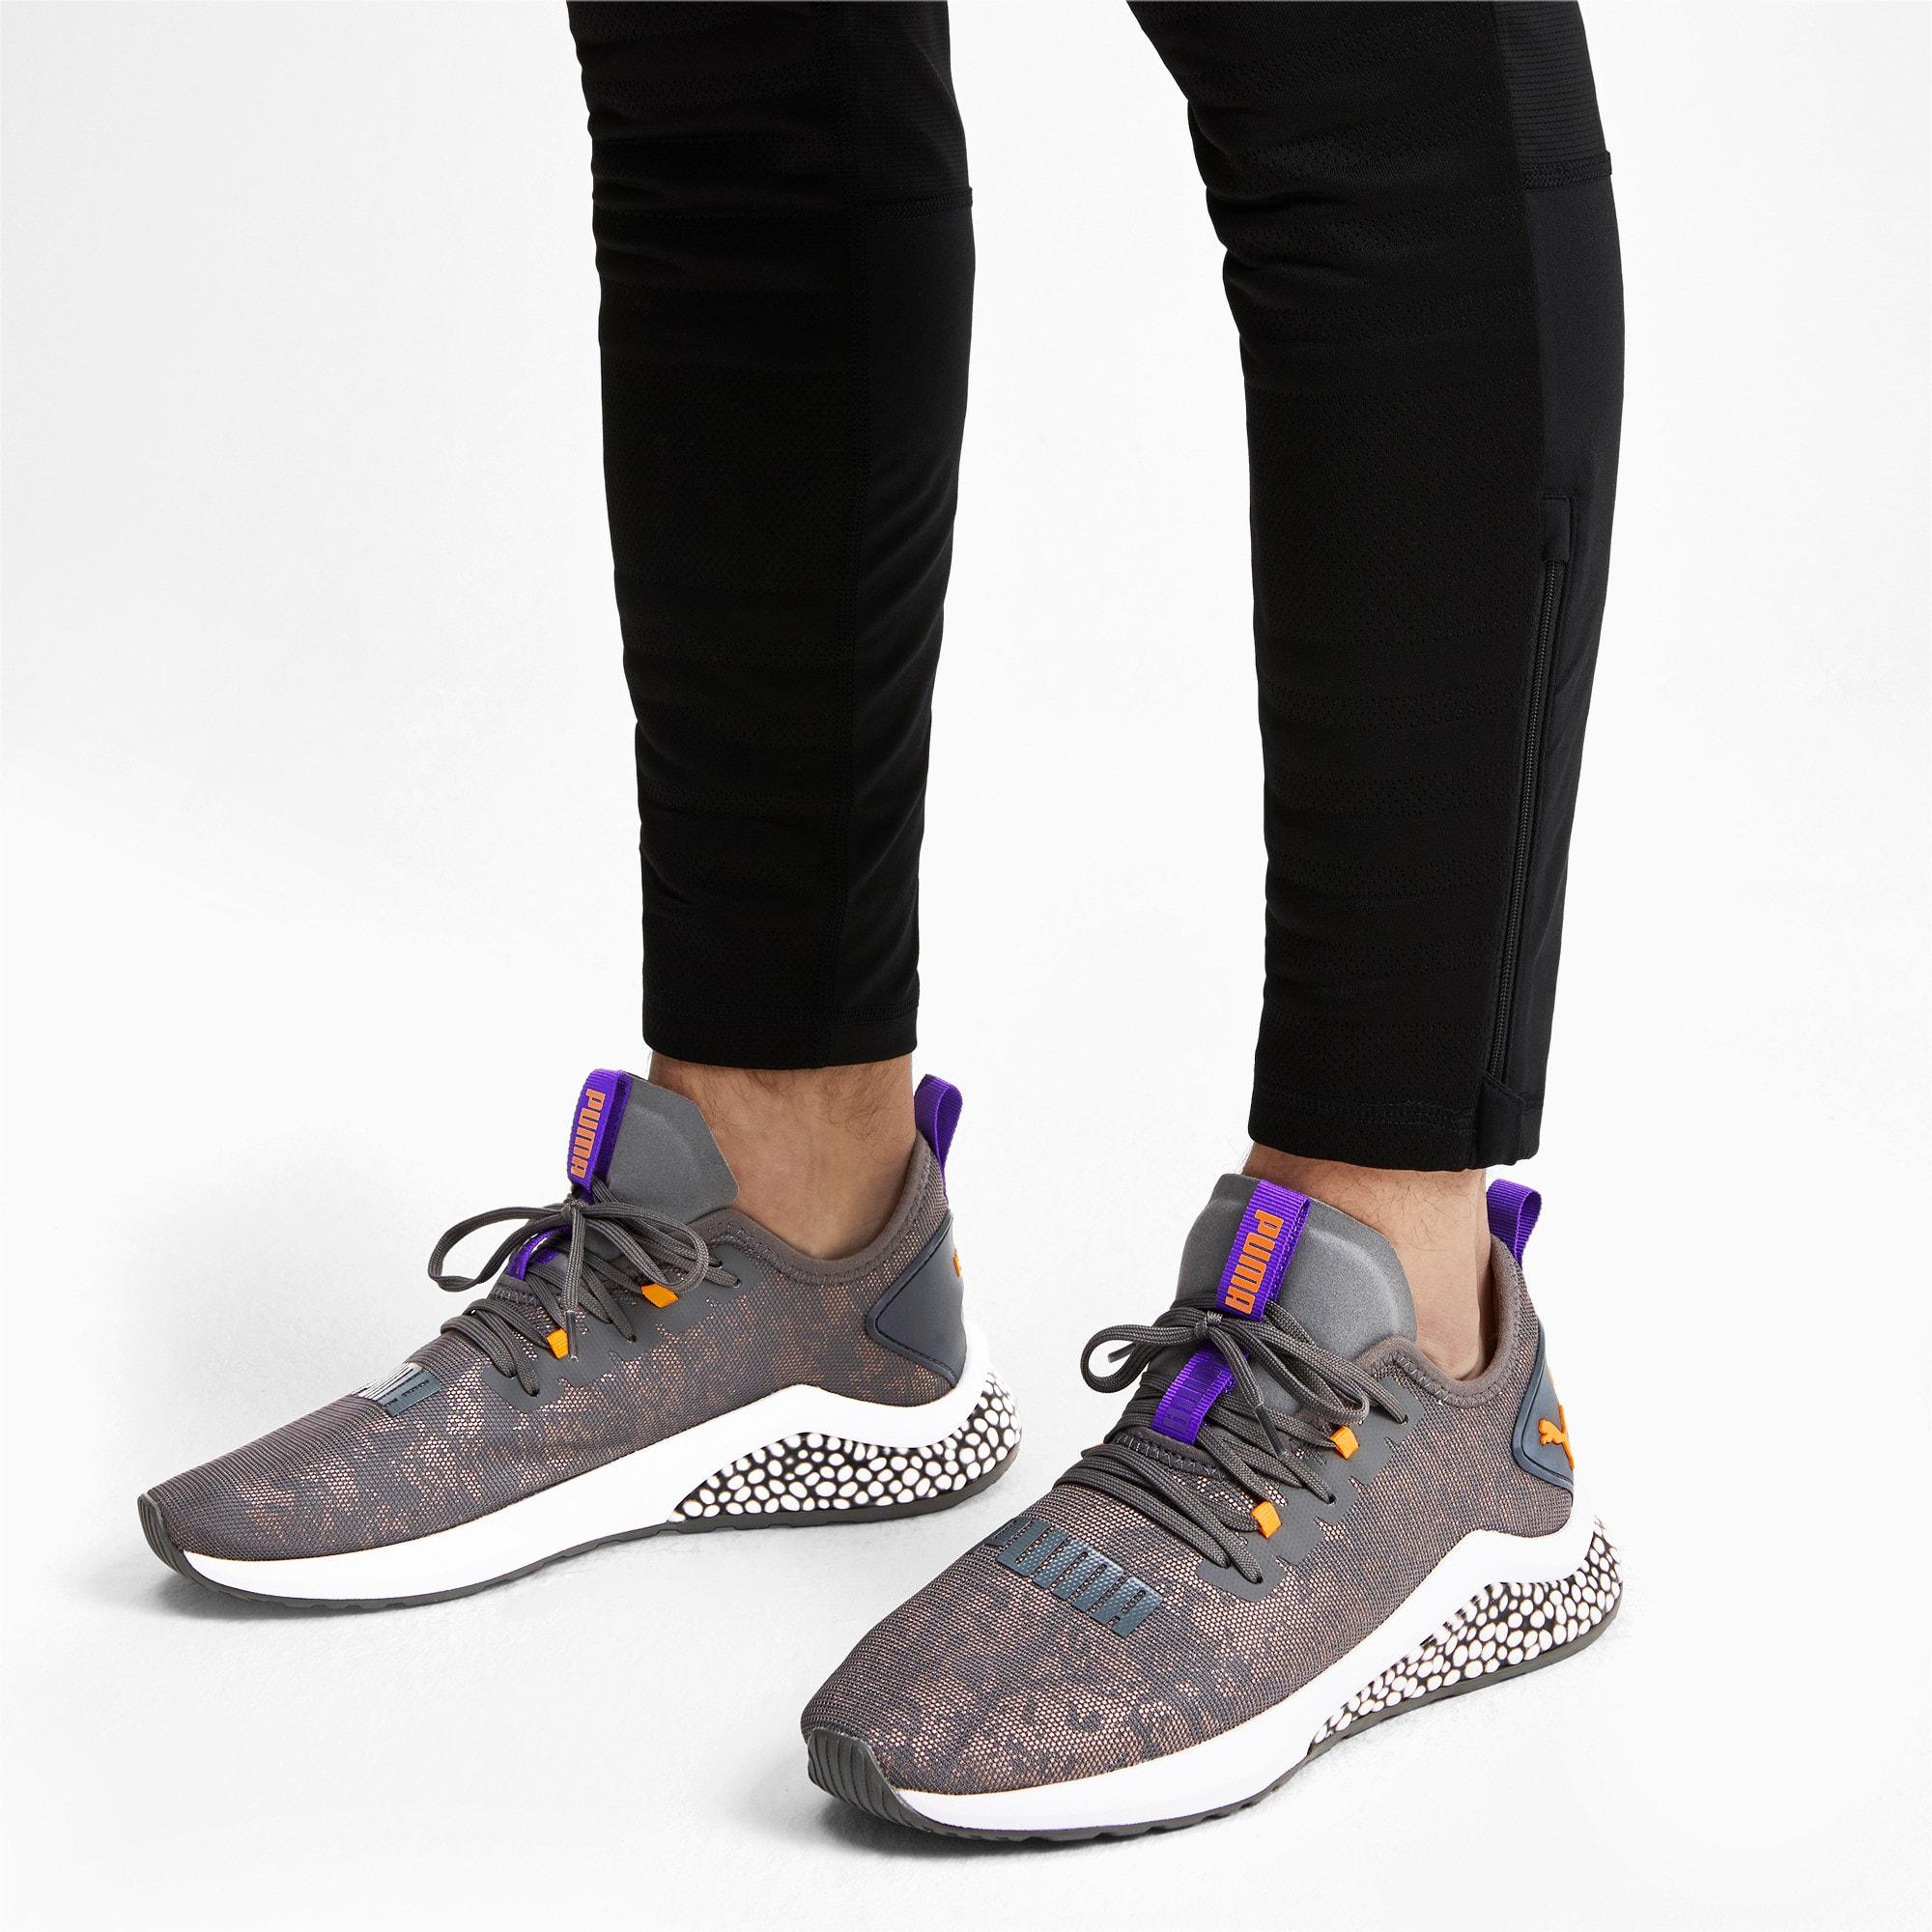 Thumbnail 3 of HYBRID NX Rave Men's Running Shoes, CASTLEROCK-Purple-Orange, medium